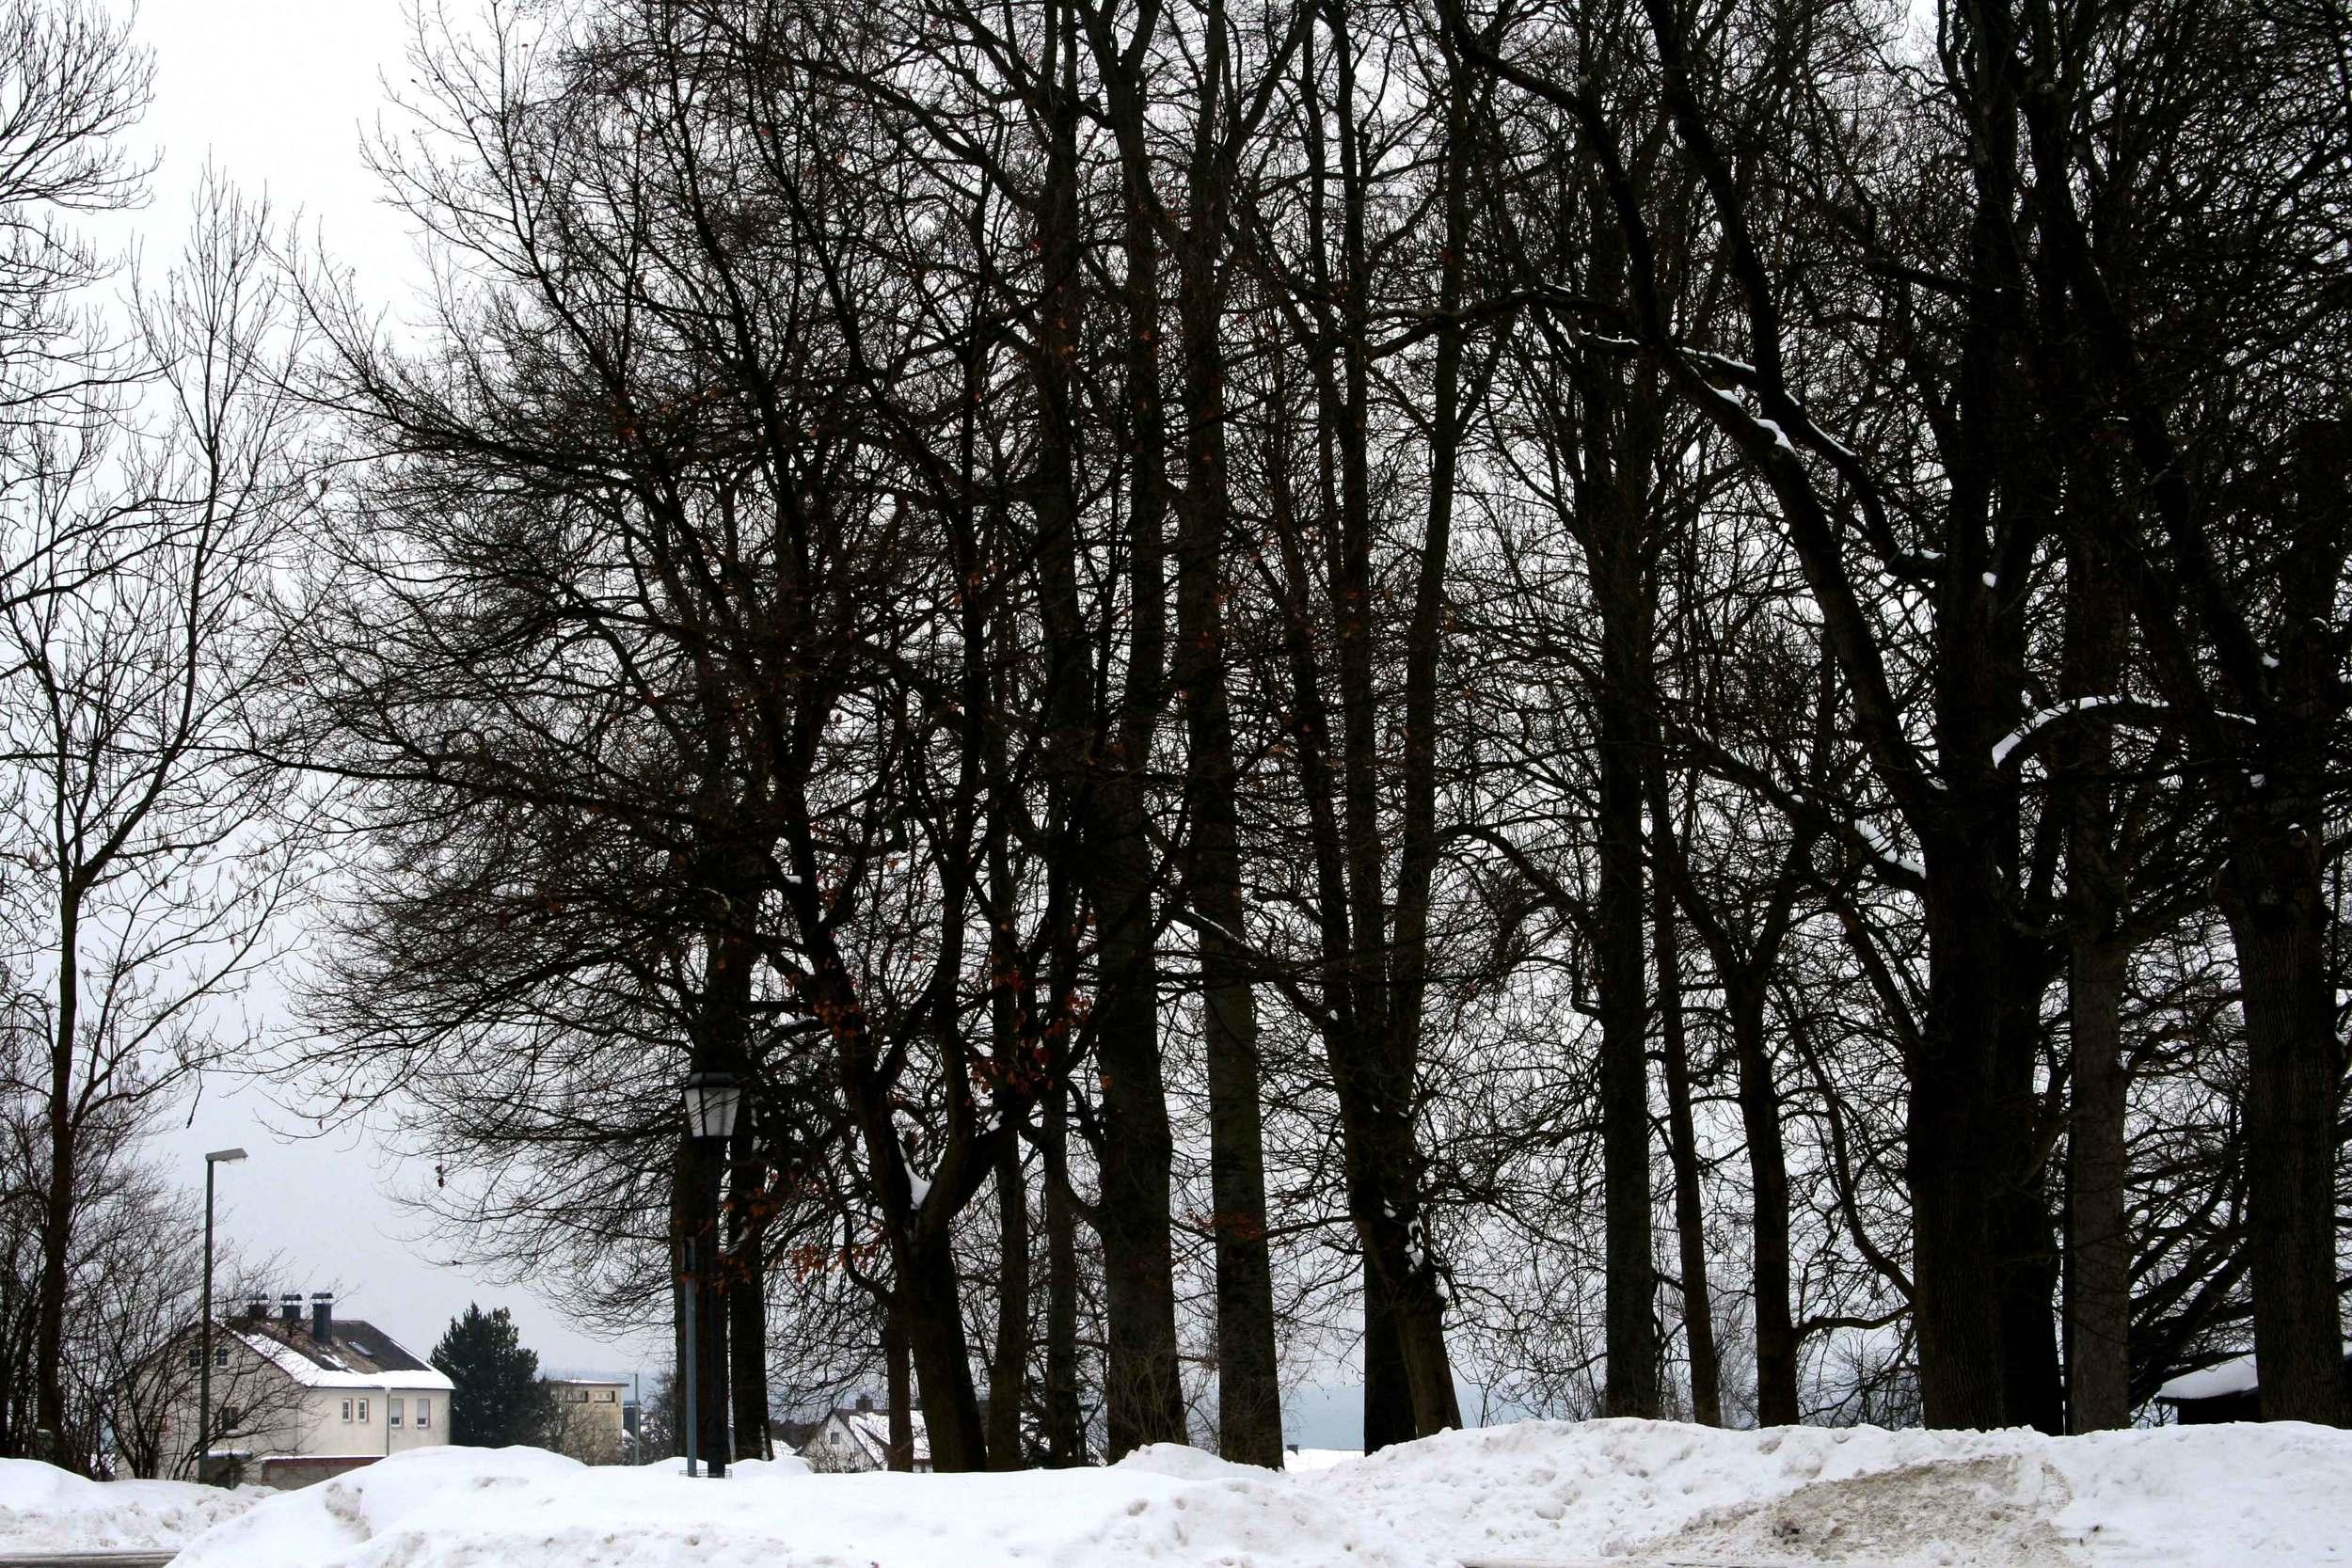 Image©Author, Konnersreuth, Bavaria, Germany in winter. Mystic, fairyland!